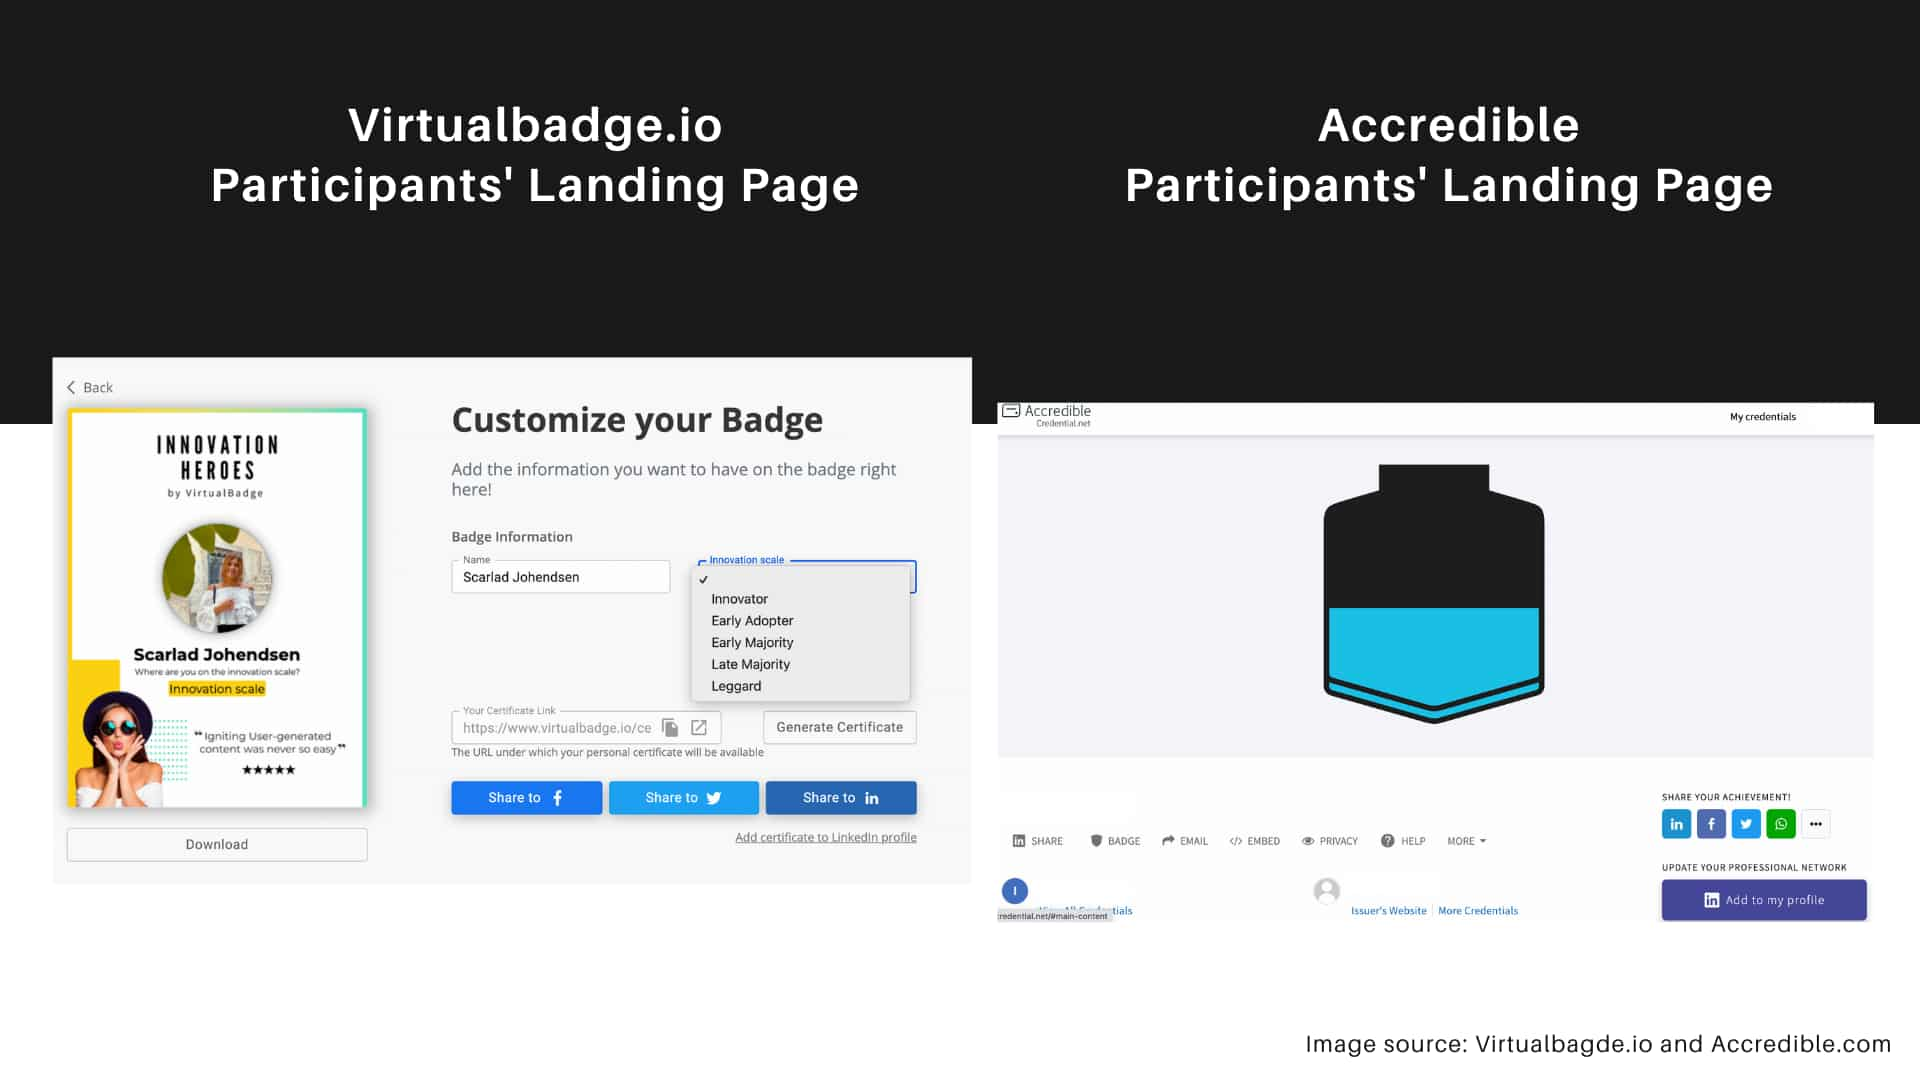 Virtualbadge.io vs Accredible - Participants' Landing Page Feature